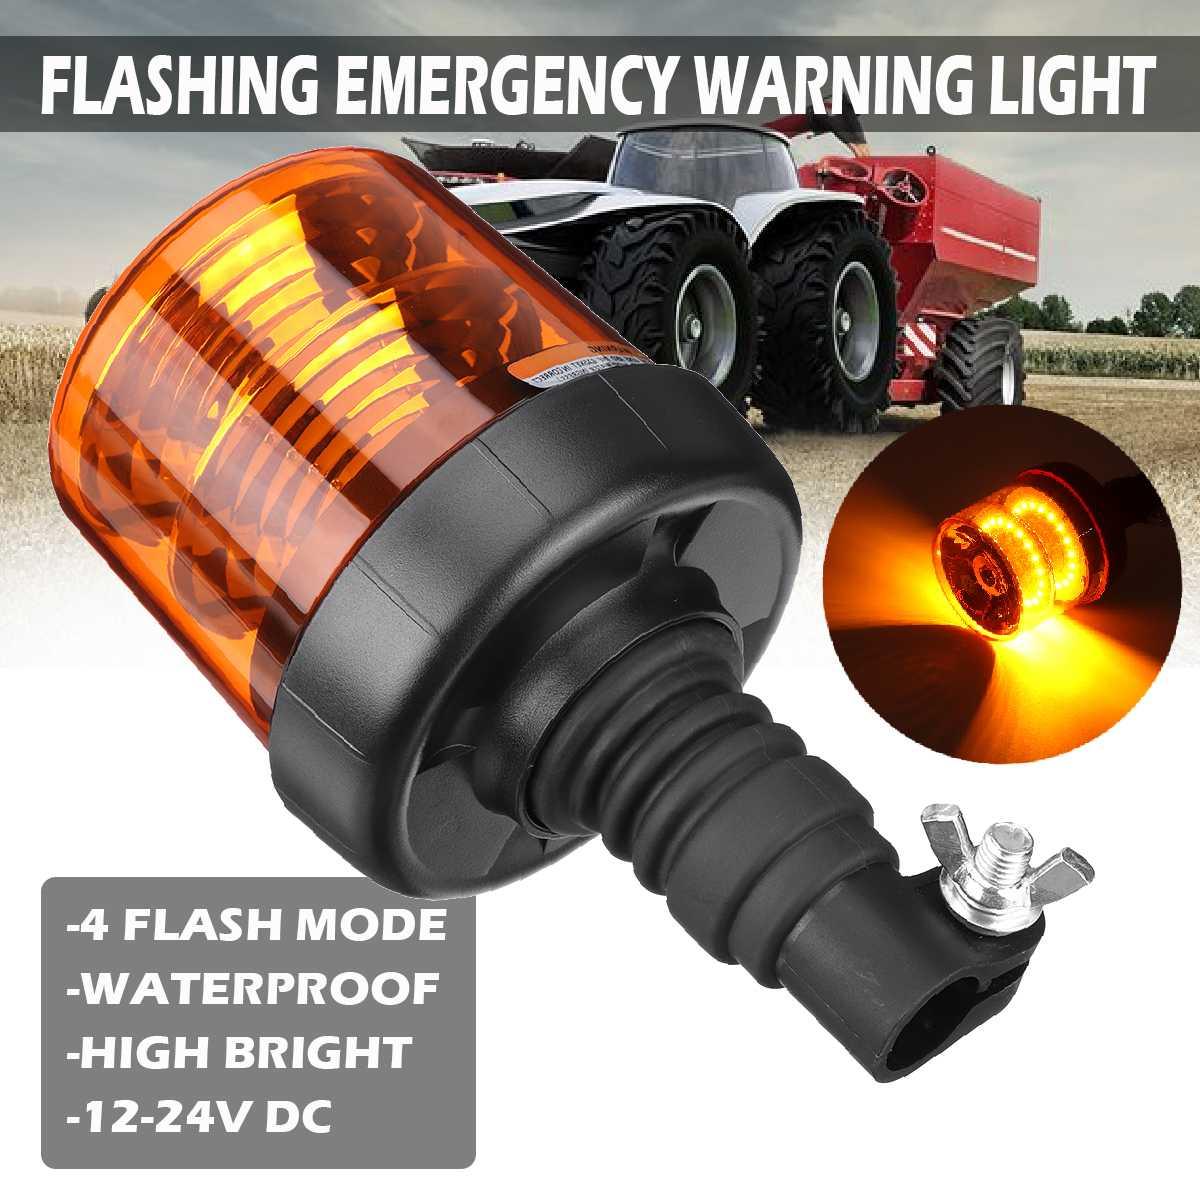 40 Led car truck strobe warning light Super Bright Flashing Emergency Warning Light Amber Beacon Working light E9 for Tractor